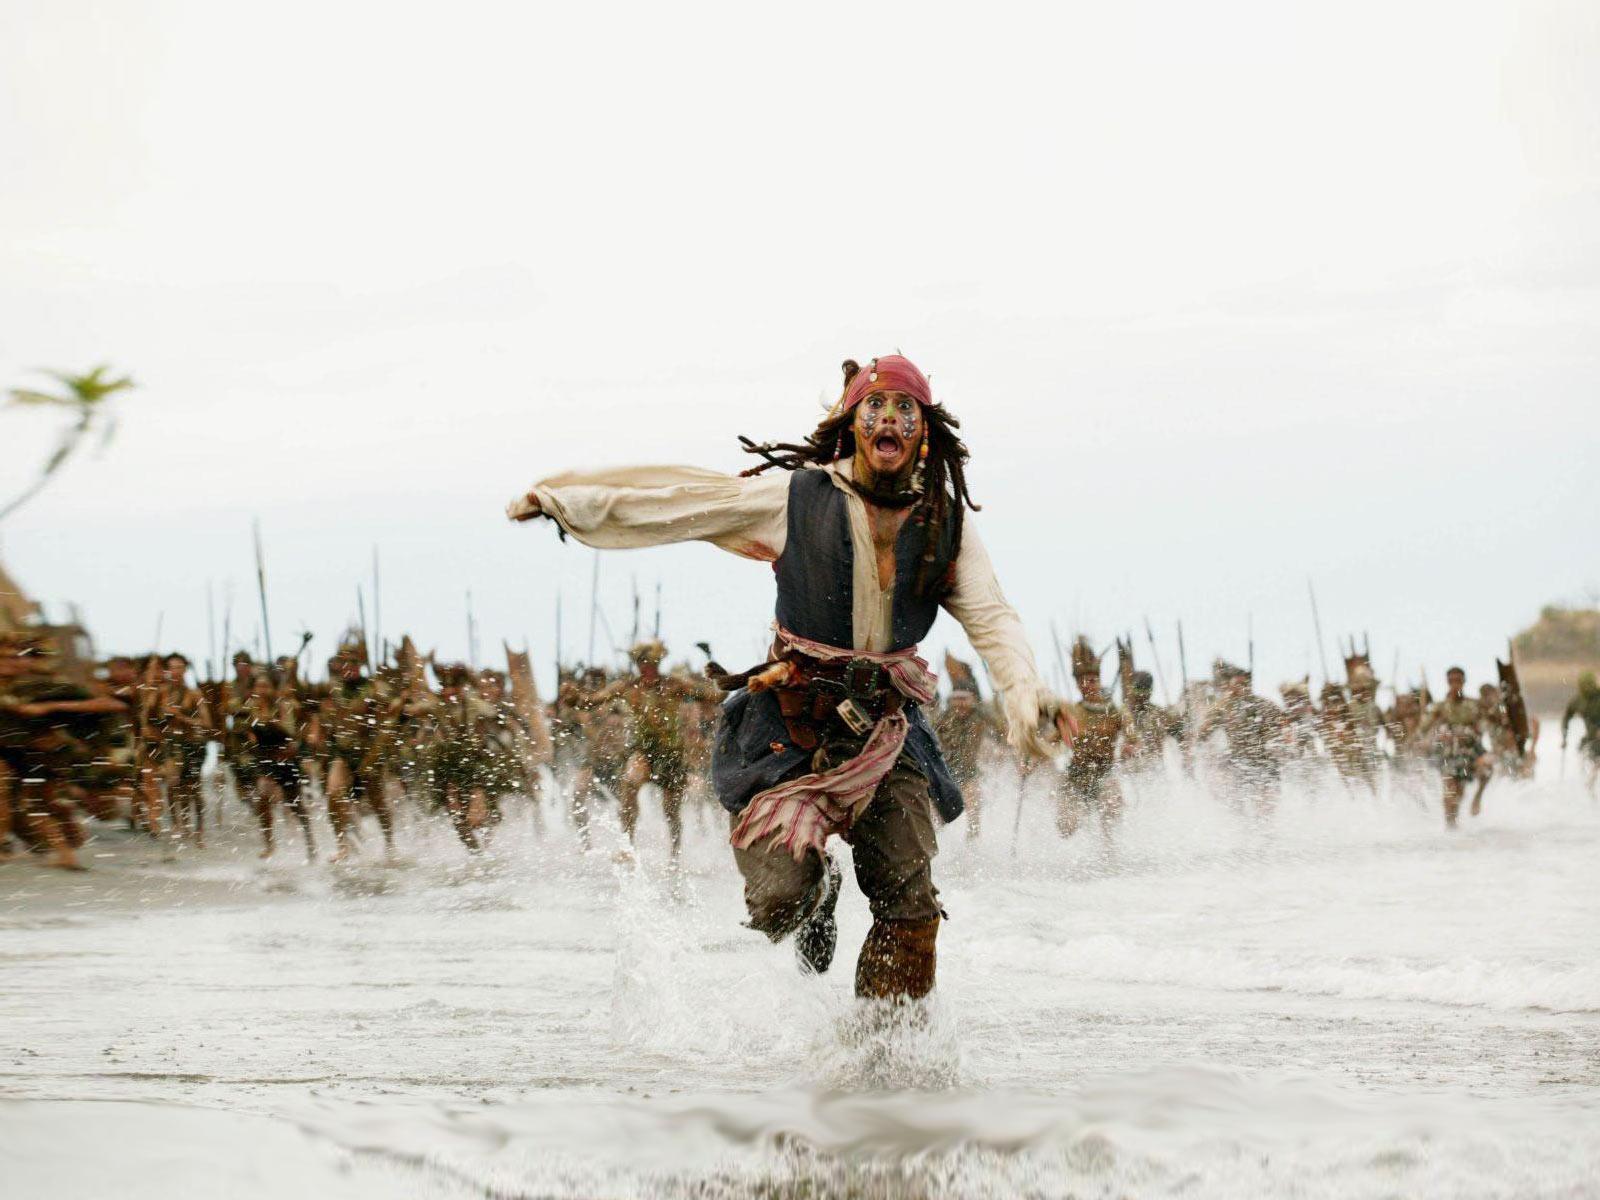 http://4.bp.blogspot.com/_9YN0yGeWu8U/TRFWZzQB_LI/AAAAAAAAAcY/18ZzuvwNbKA/s1600/Captain_Jack_Sparrow_-_Johnny_Depp.jpg